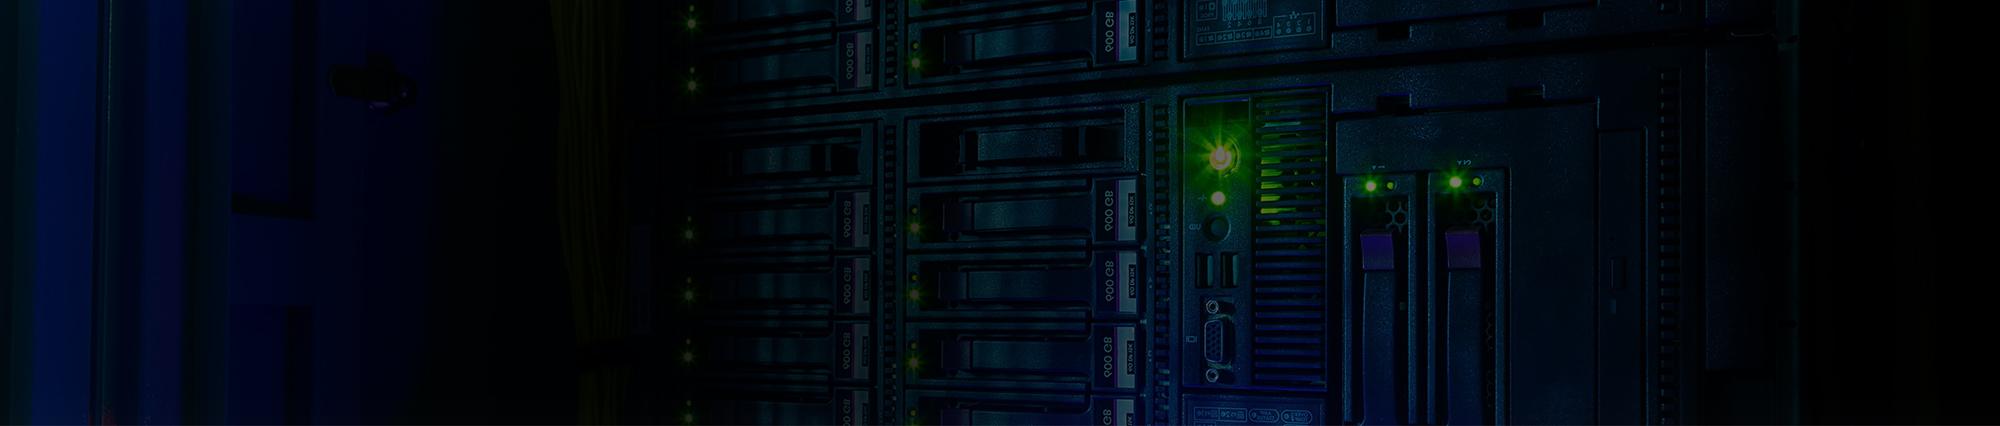 NVMe SSD VPS | RackService